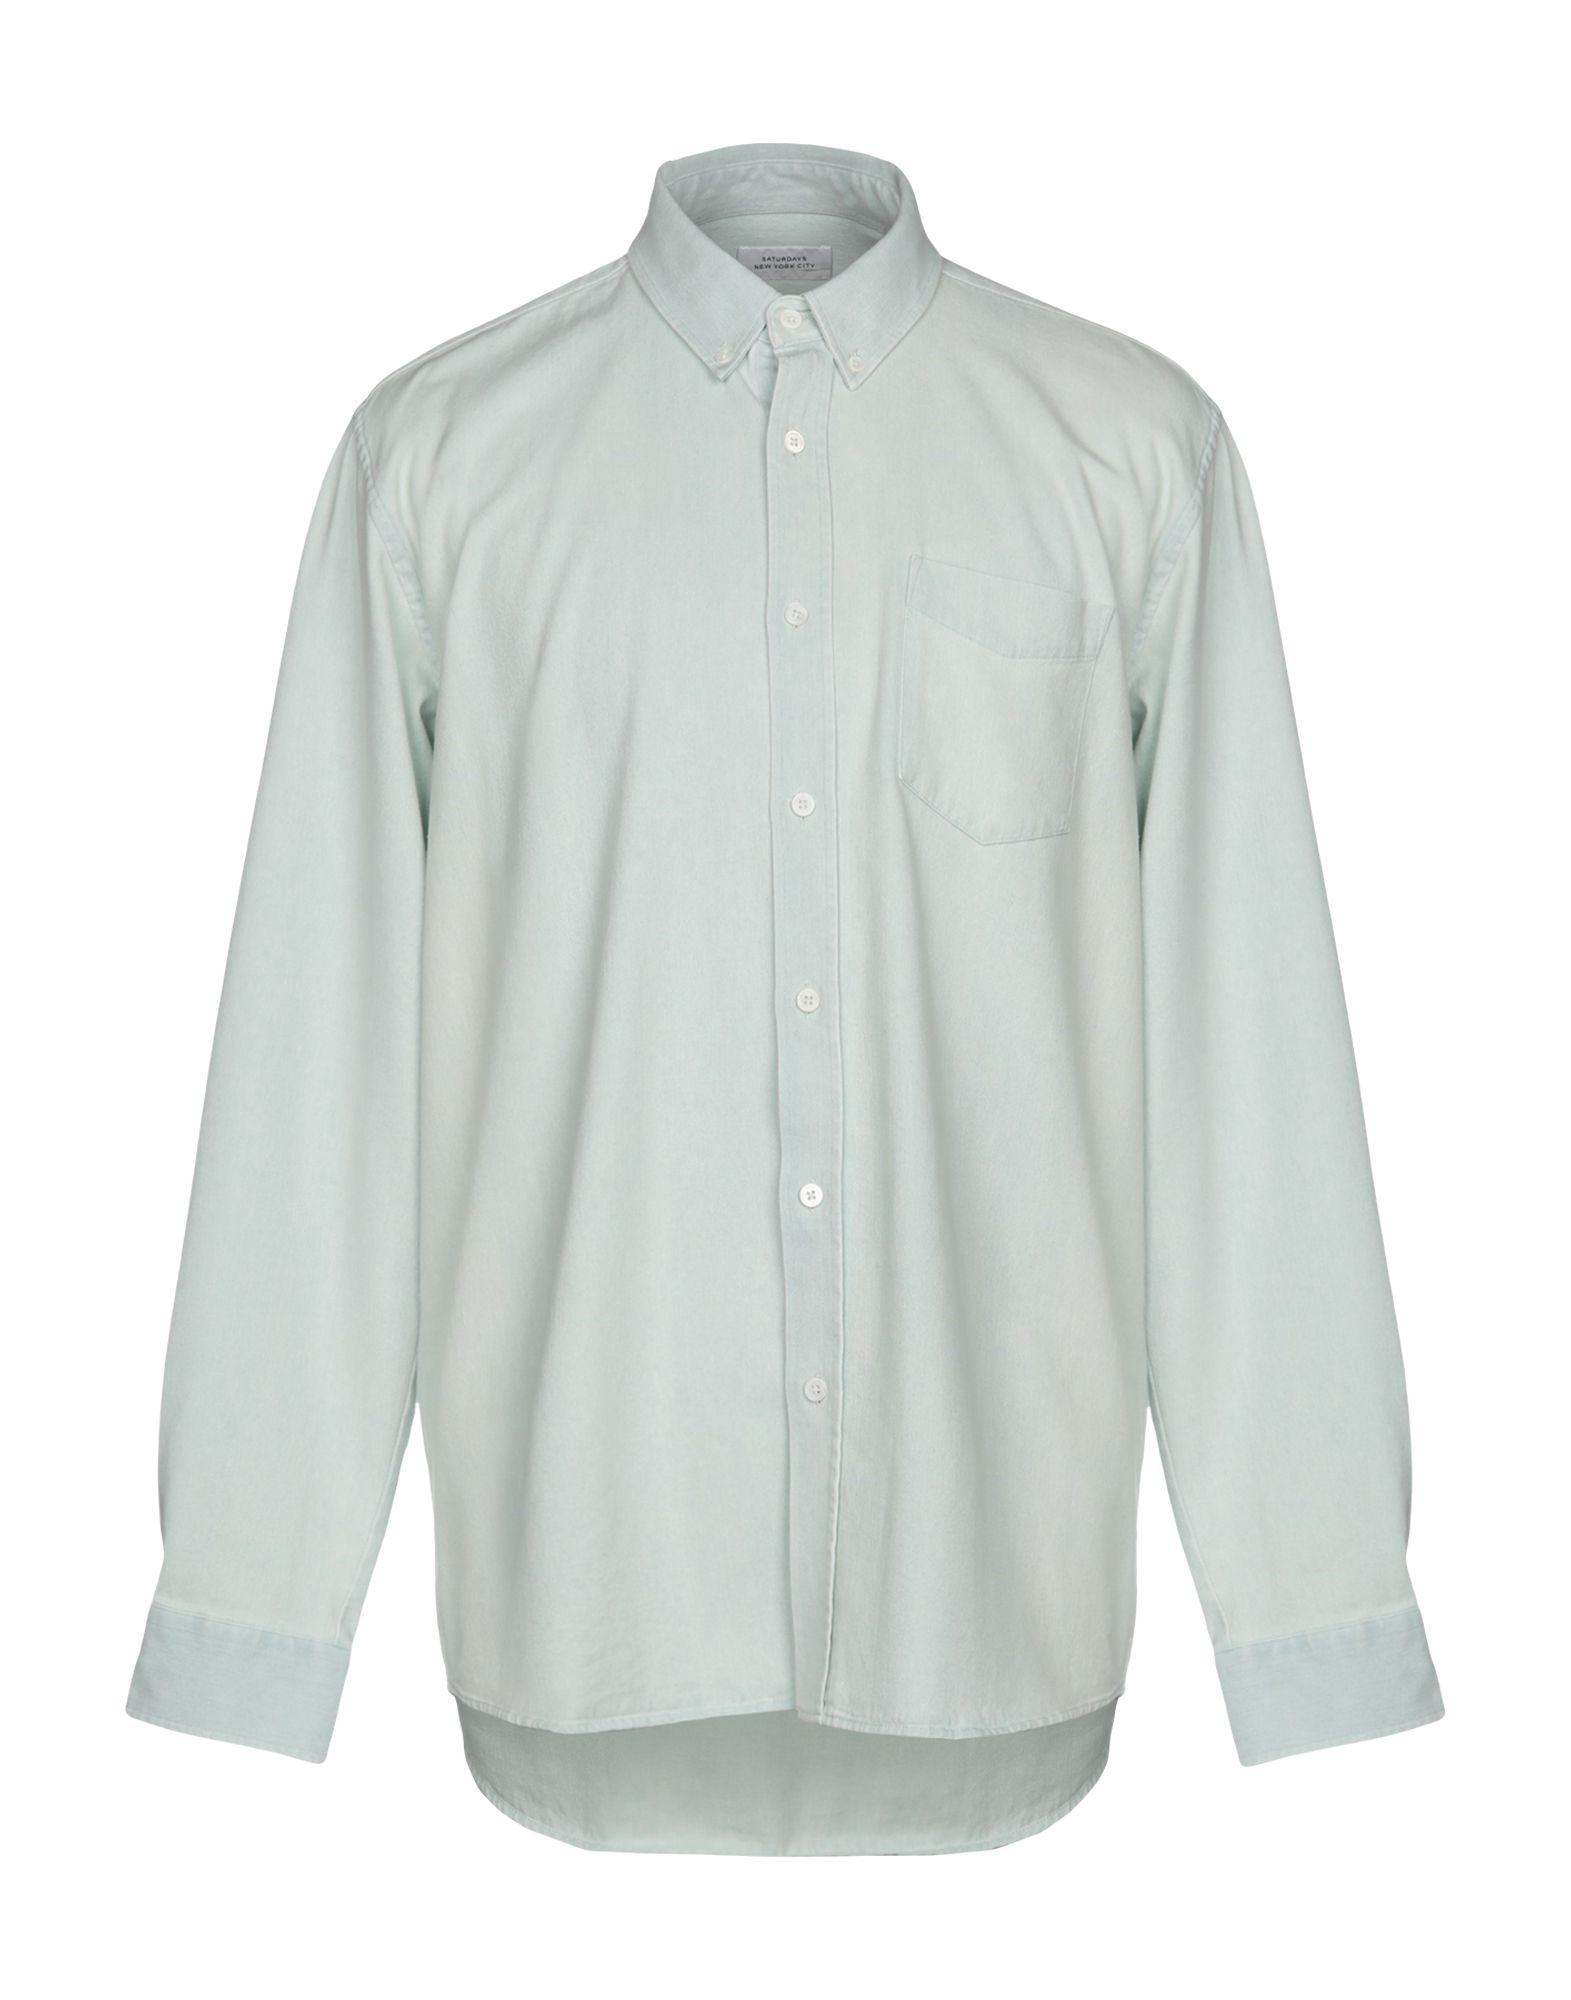 SATURDAYS NEW YORK CITY Джинсовая рубашка